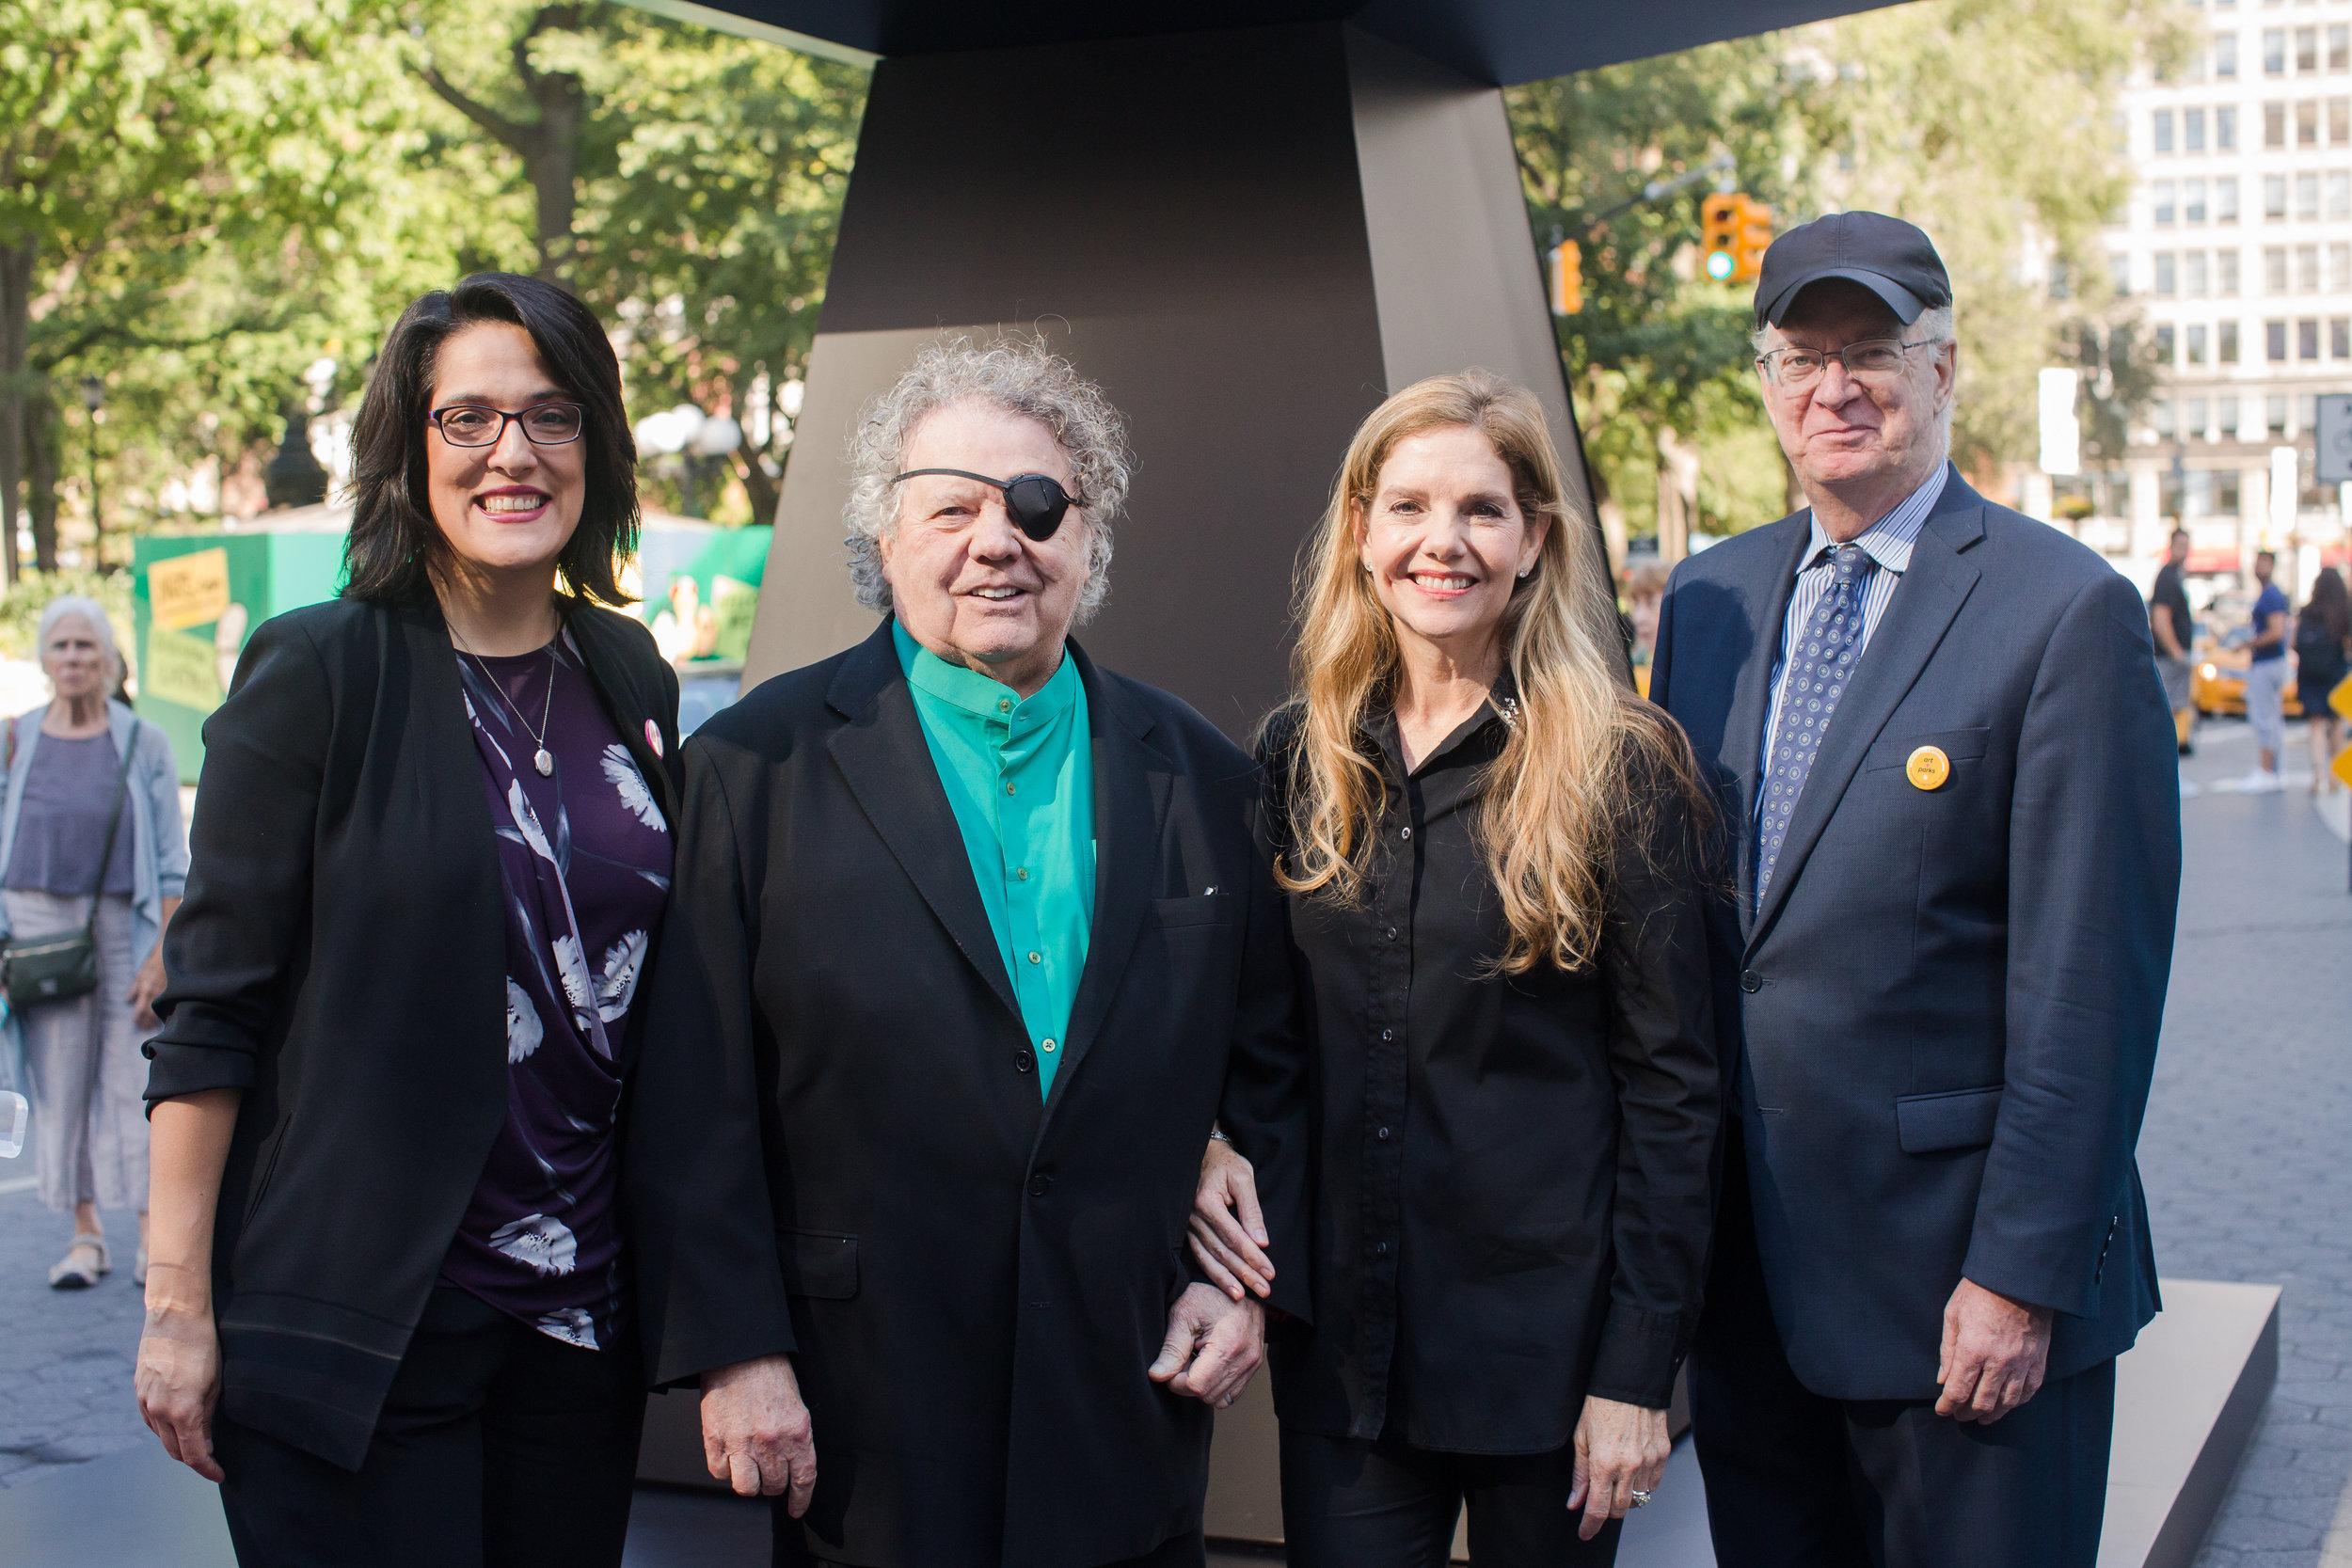 Union Square Partnership Executive Director Jennifer Falk, Dale Chihuly, Leslie Jackson Chihuly, NYC Parks Commissioner William Castro.